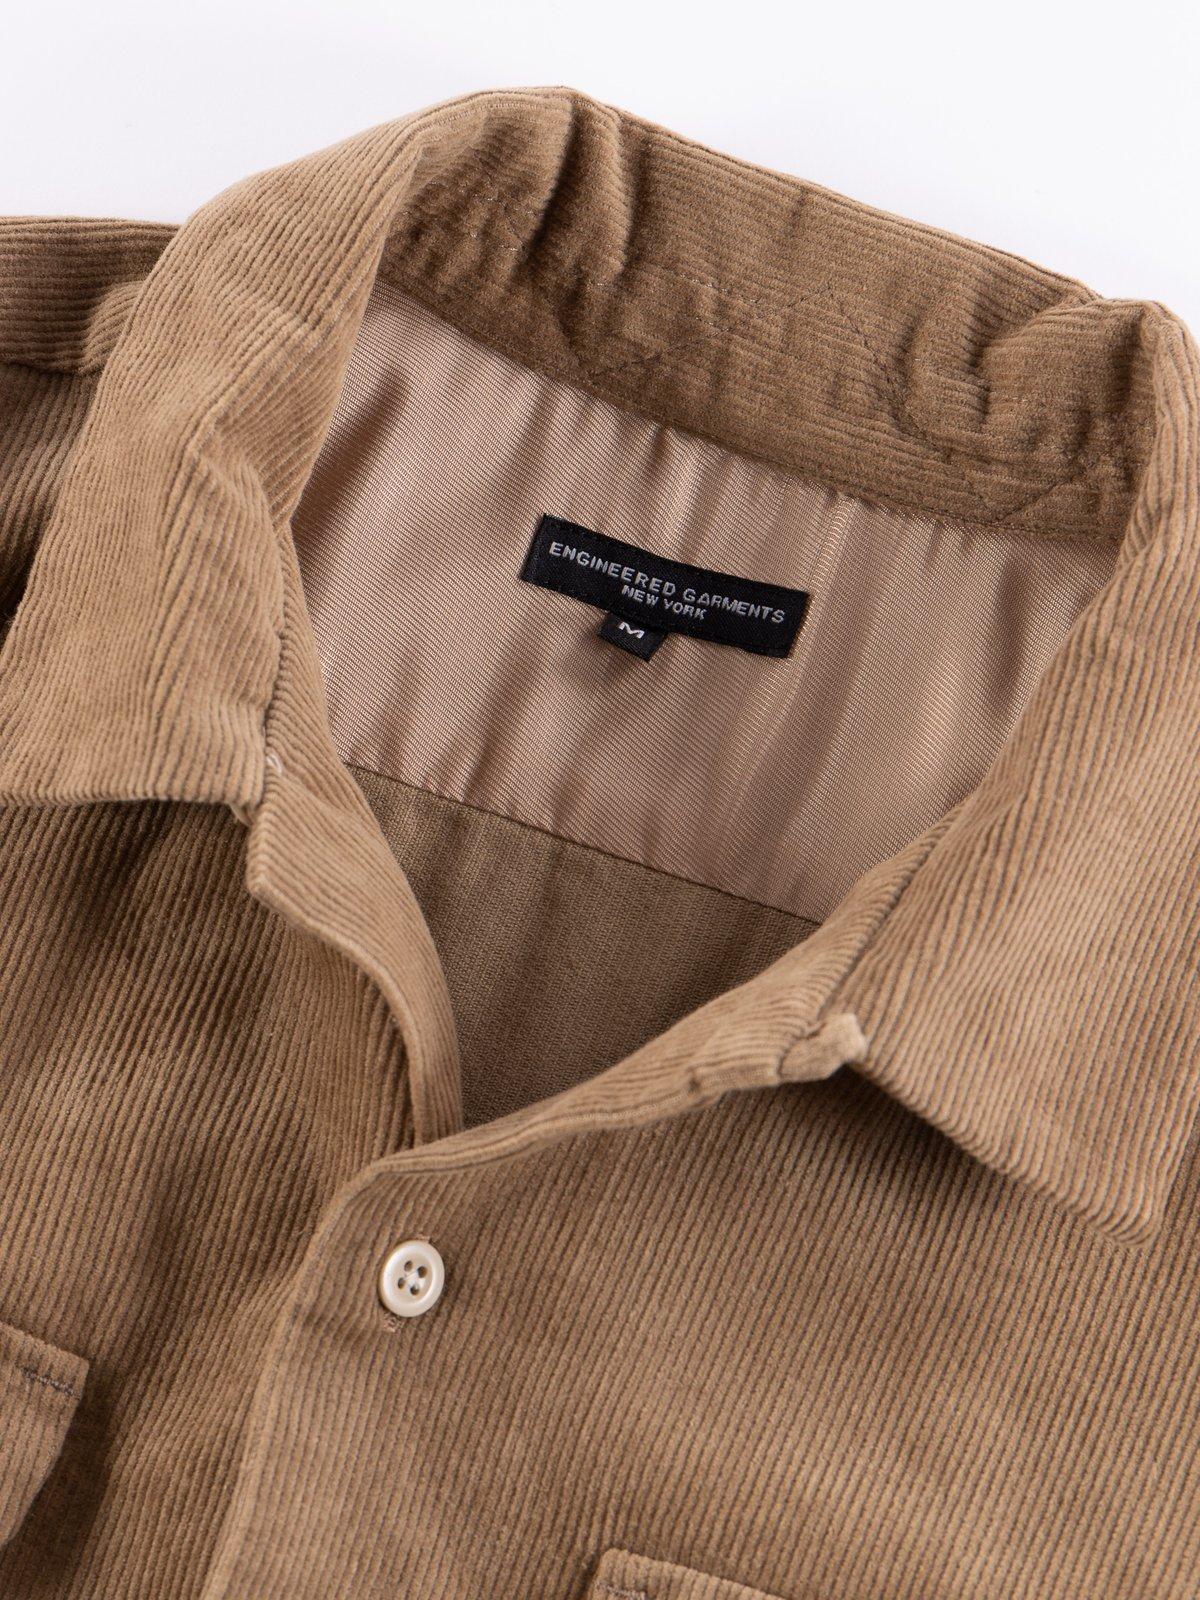 Khaki 14W Corduroy Classic Shirt - Image 6